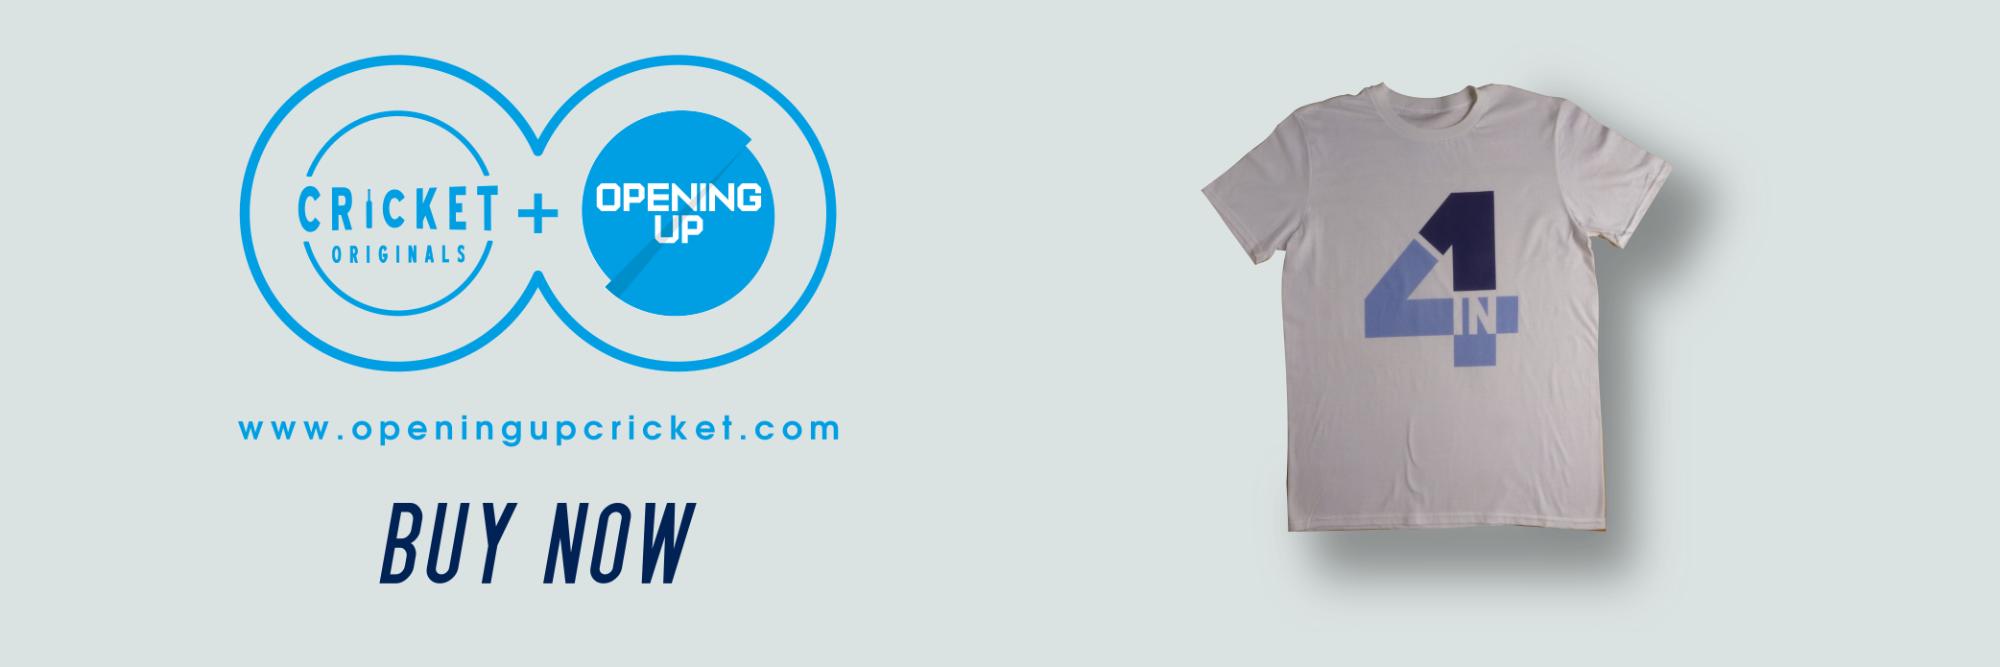 UK cricket t-shirts